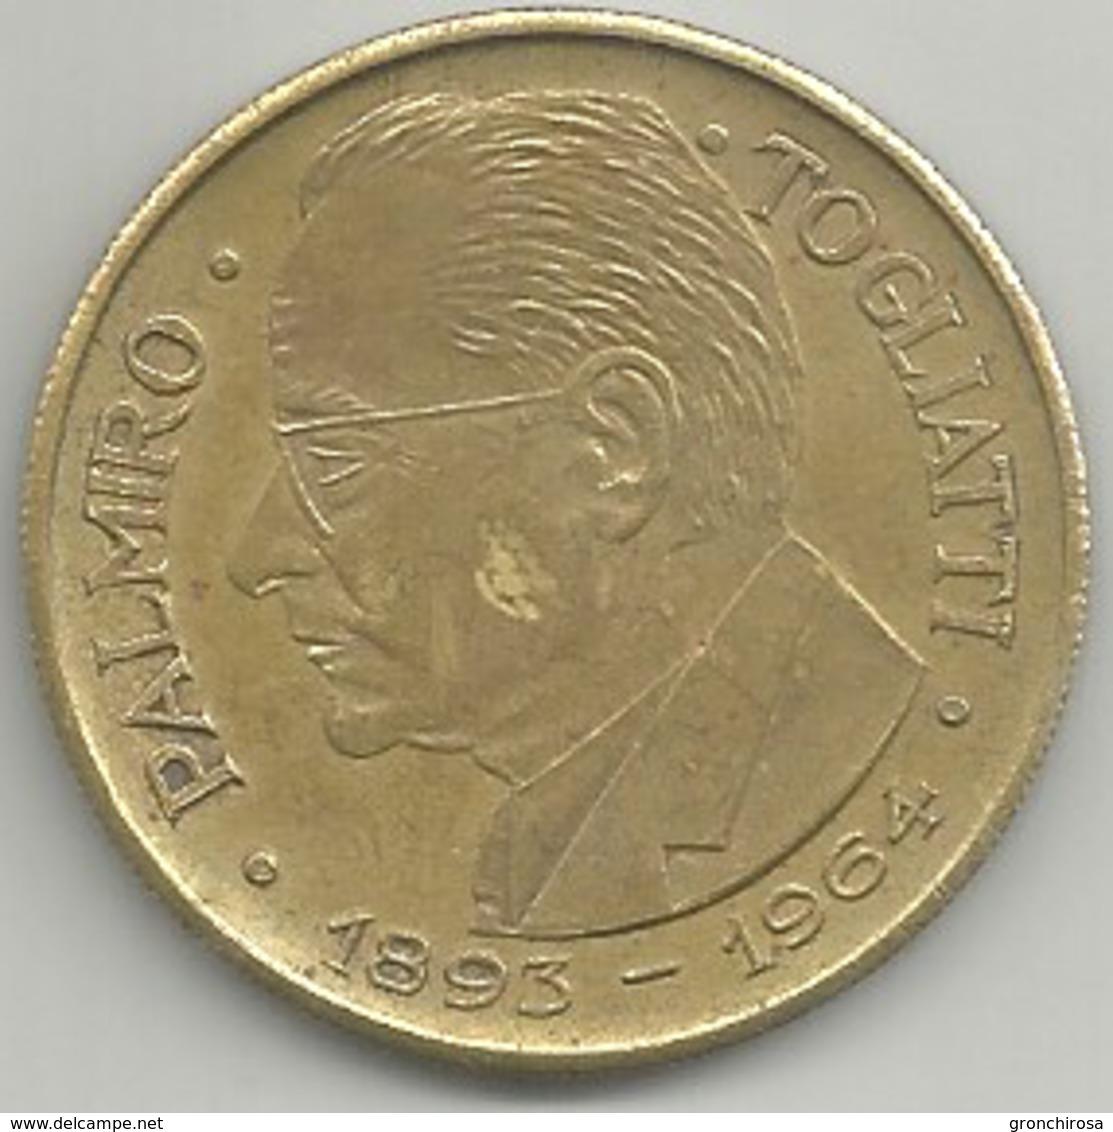 Togliatti Palmiro 1893 - 1964, P.C.I., Ae. Gr. 15 Cm. 3,5. - Italia